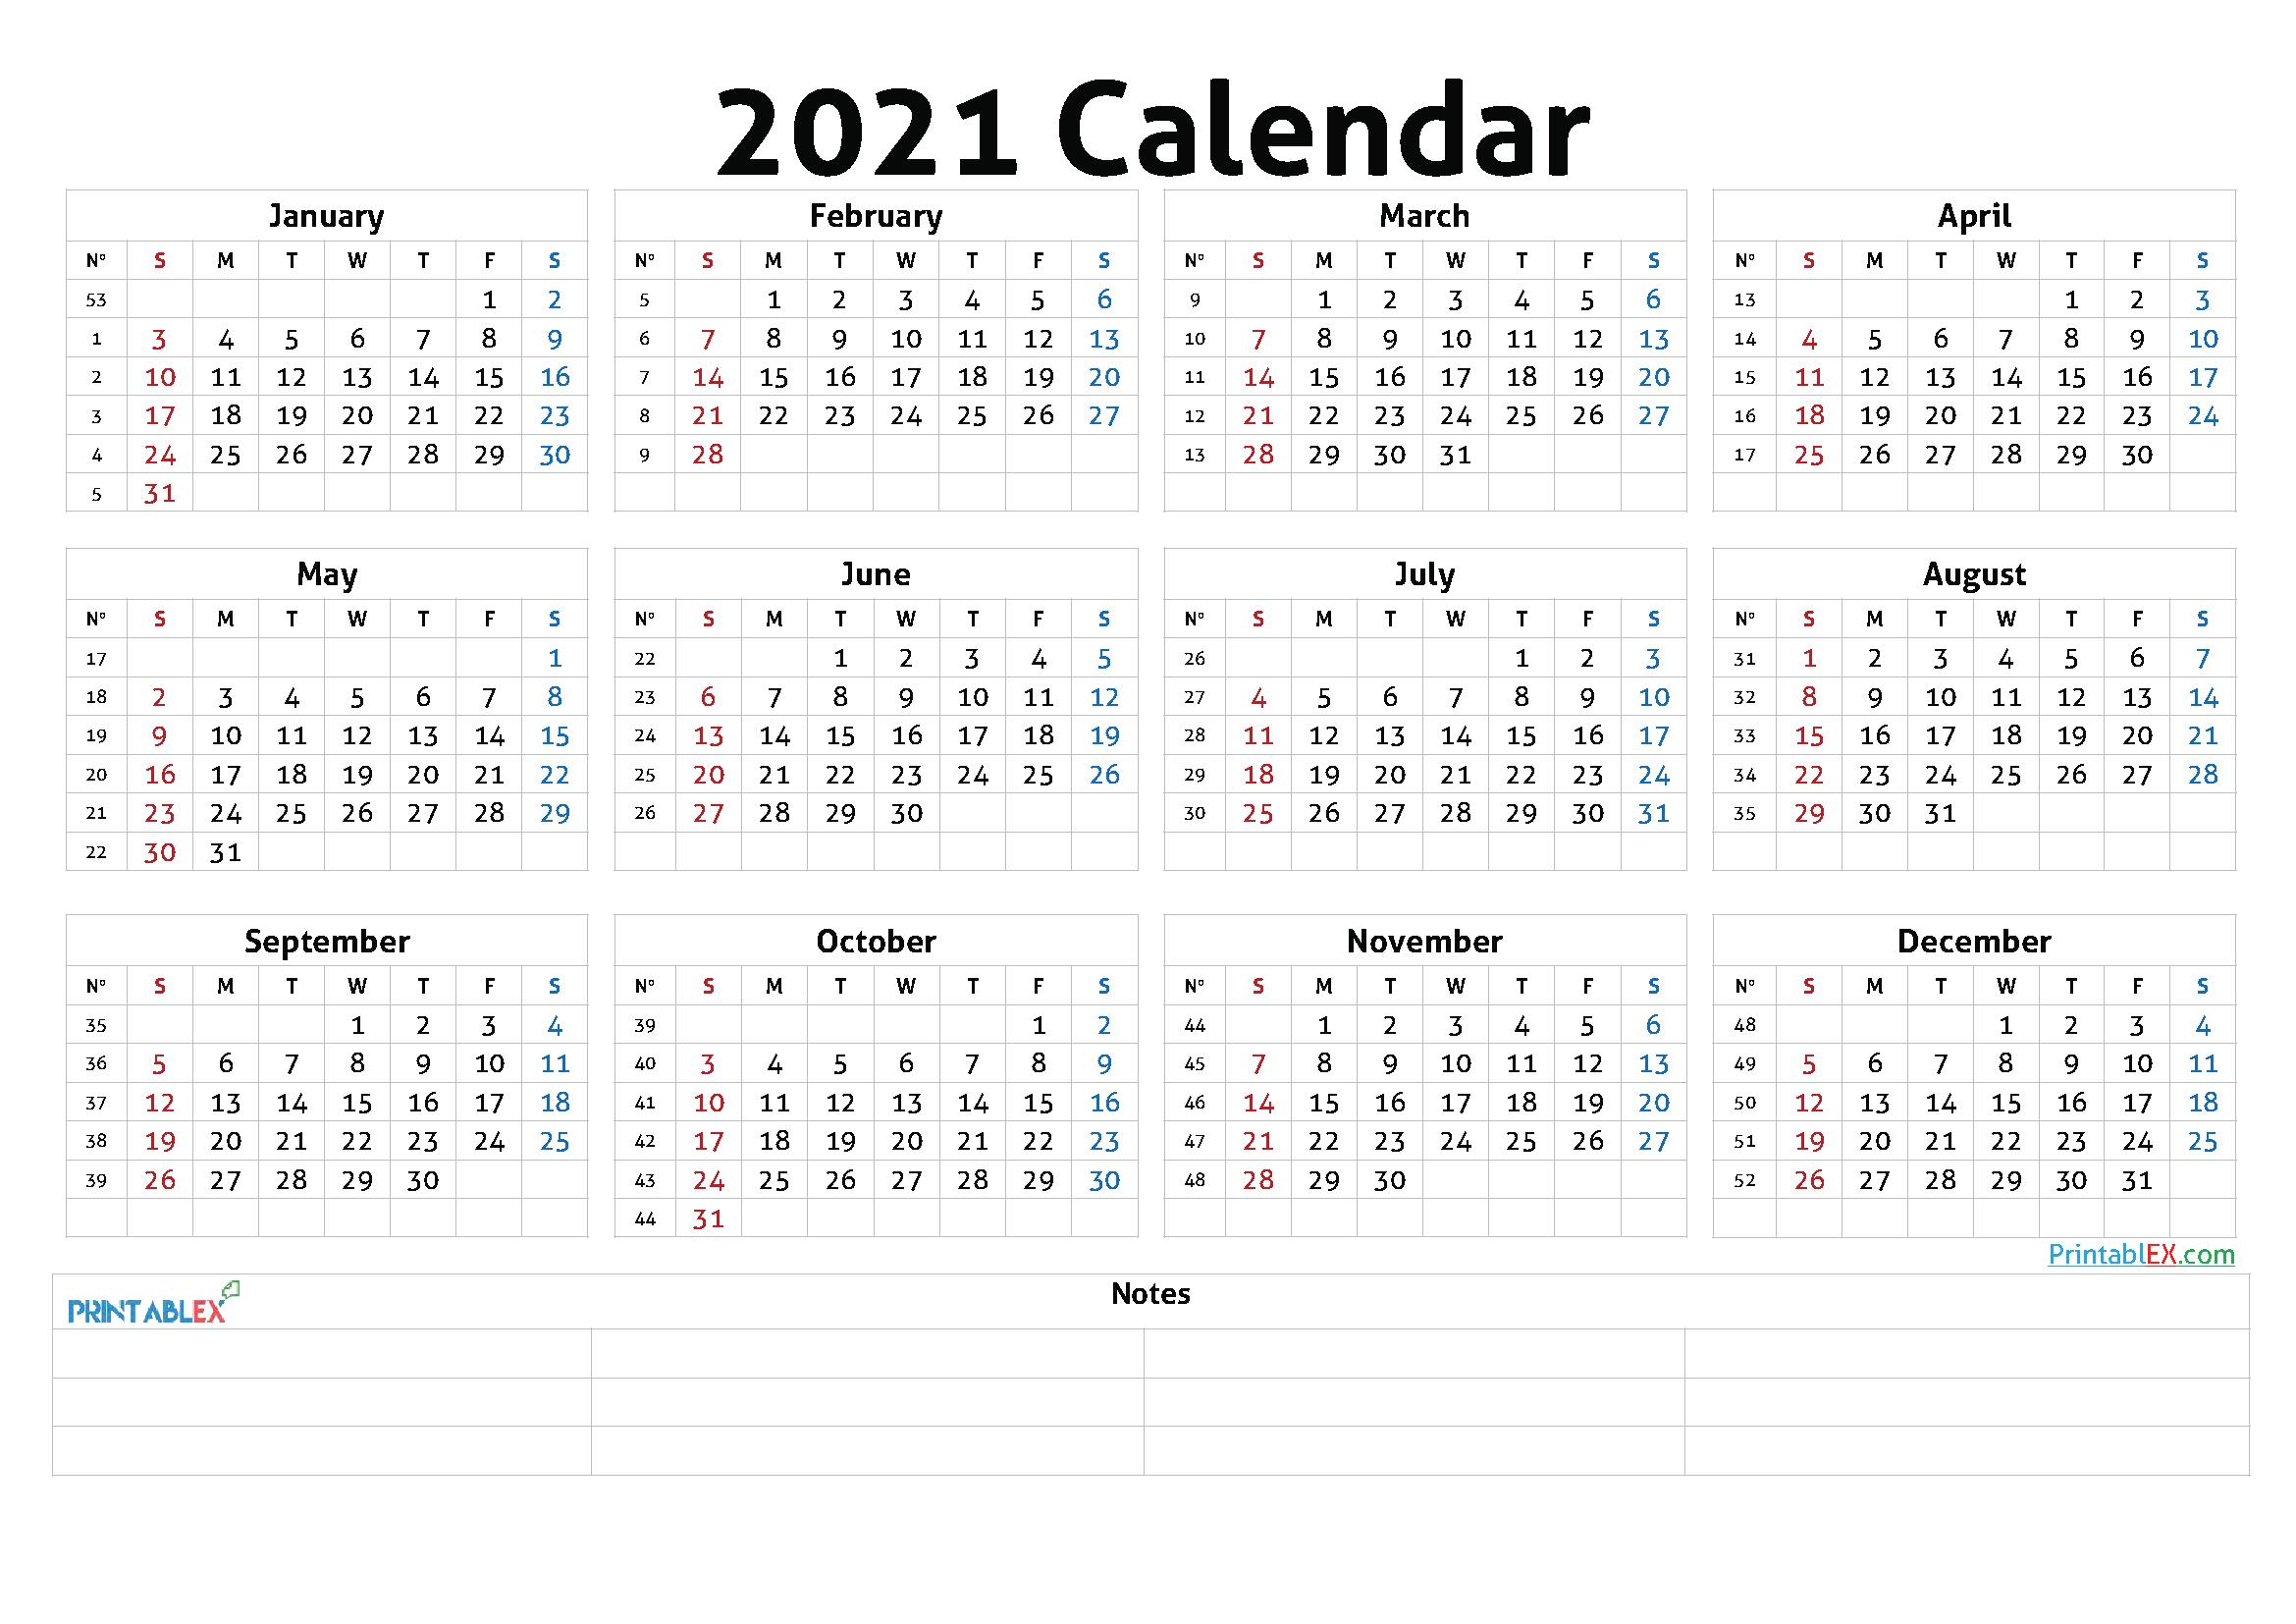 Printable 2021 Calendaryear